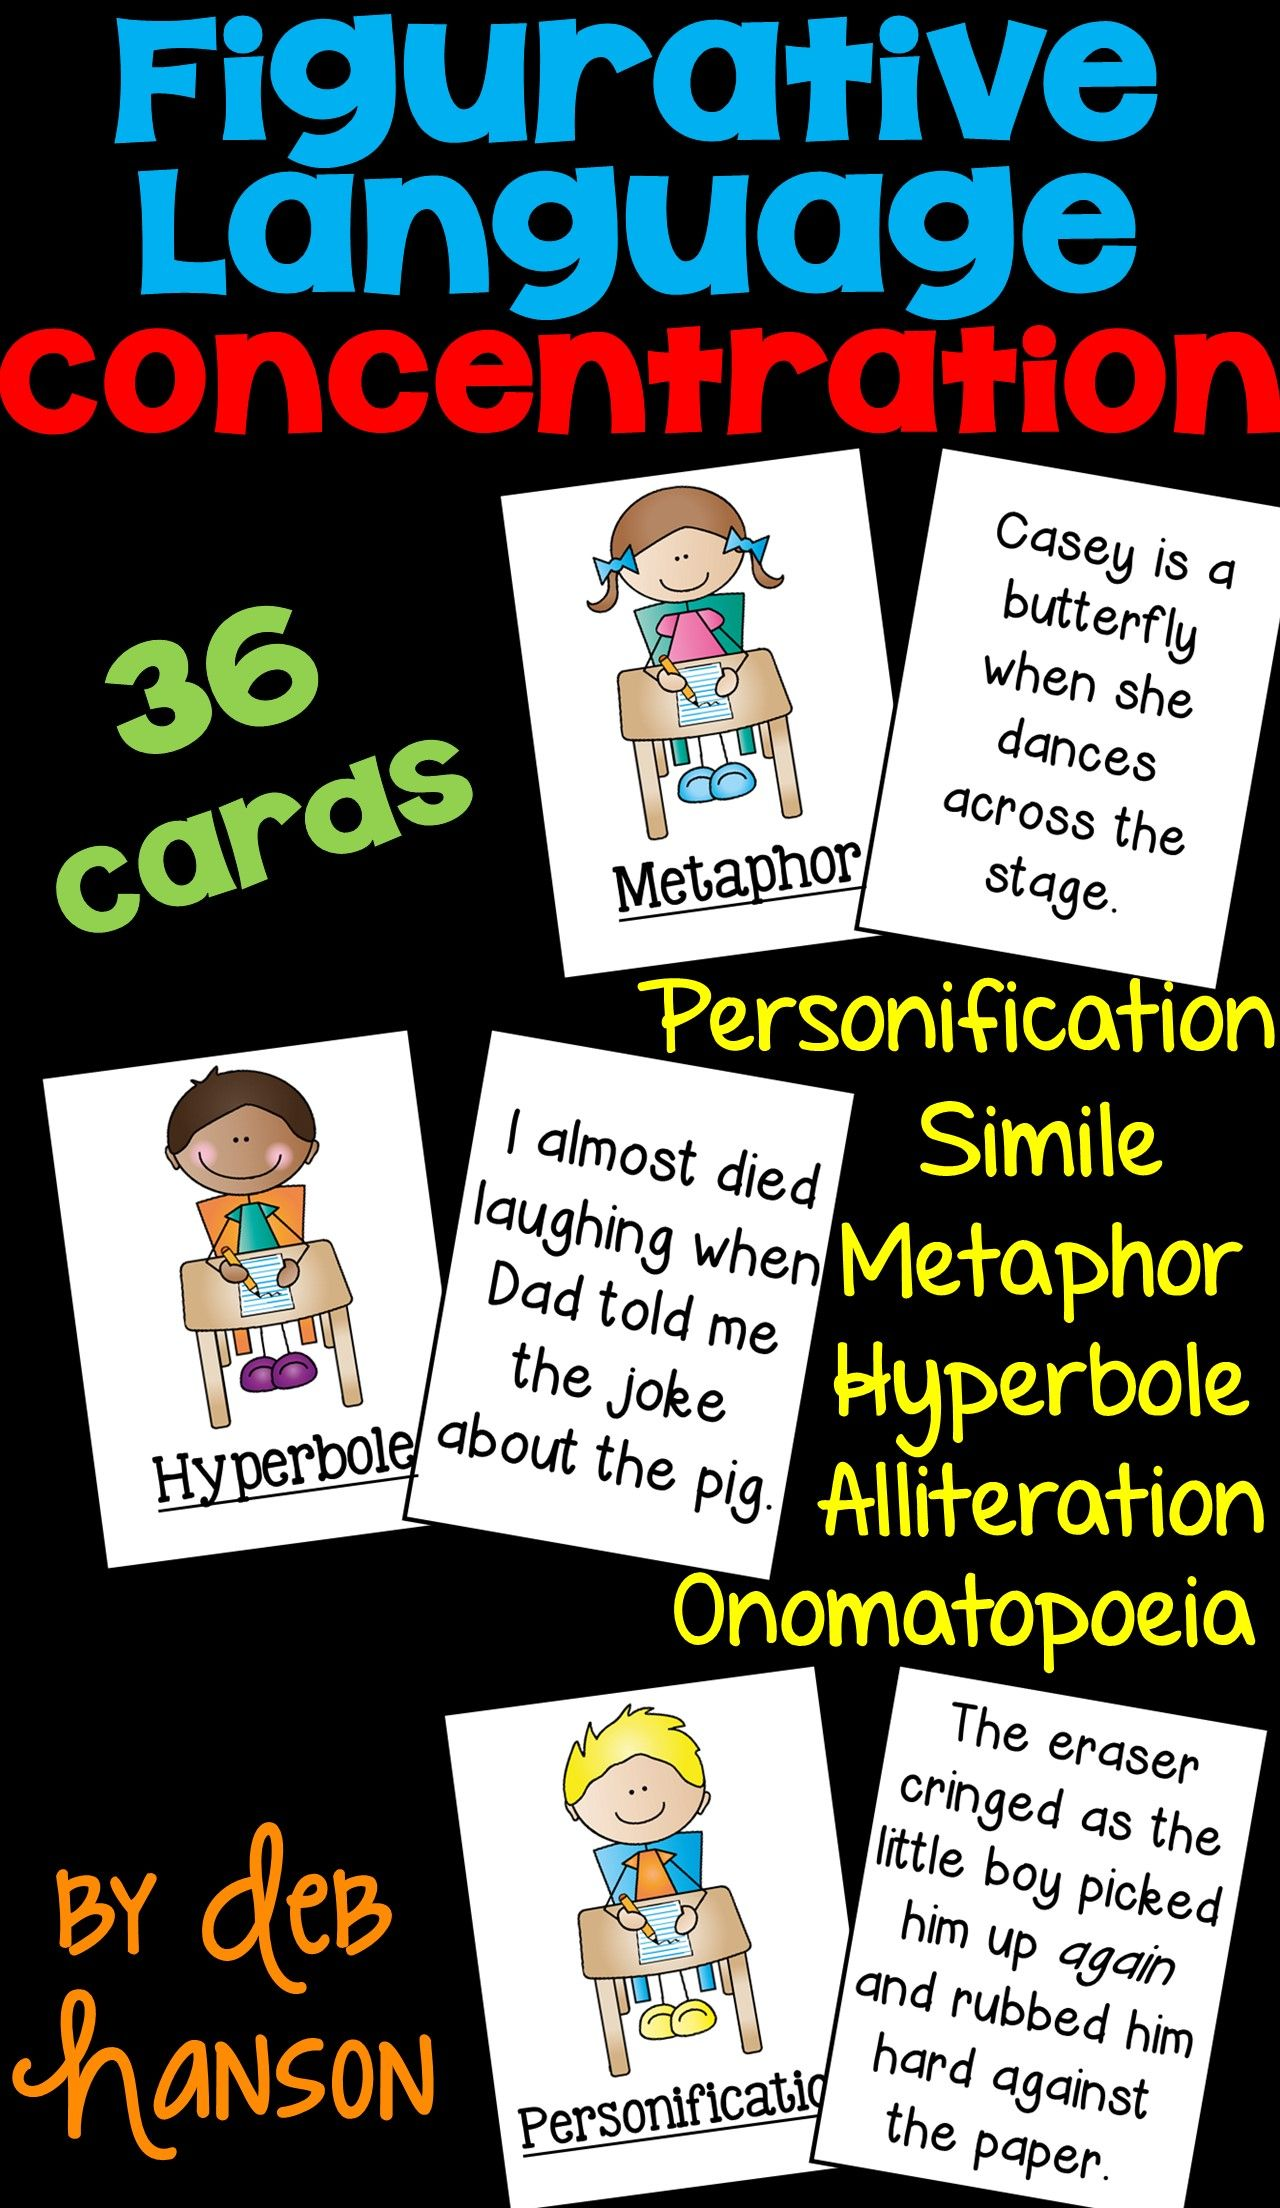 Figurative Language Concentration Game Simile Metaphor Alliteration Onomat